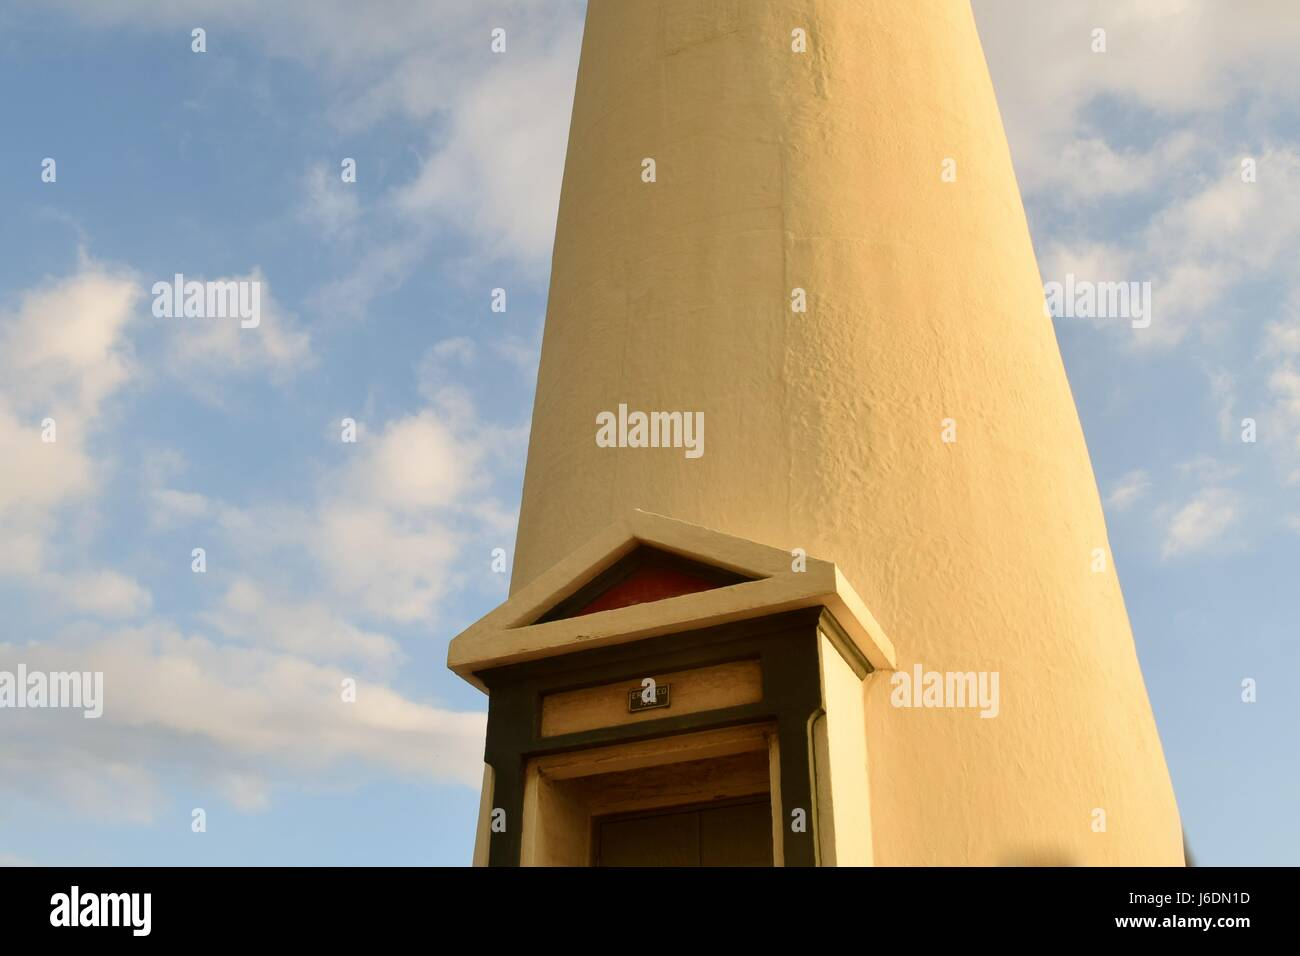 Barbers Point Light House, located on Oahu, Hawaii. - Stock Image